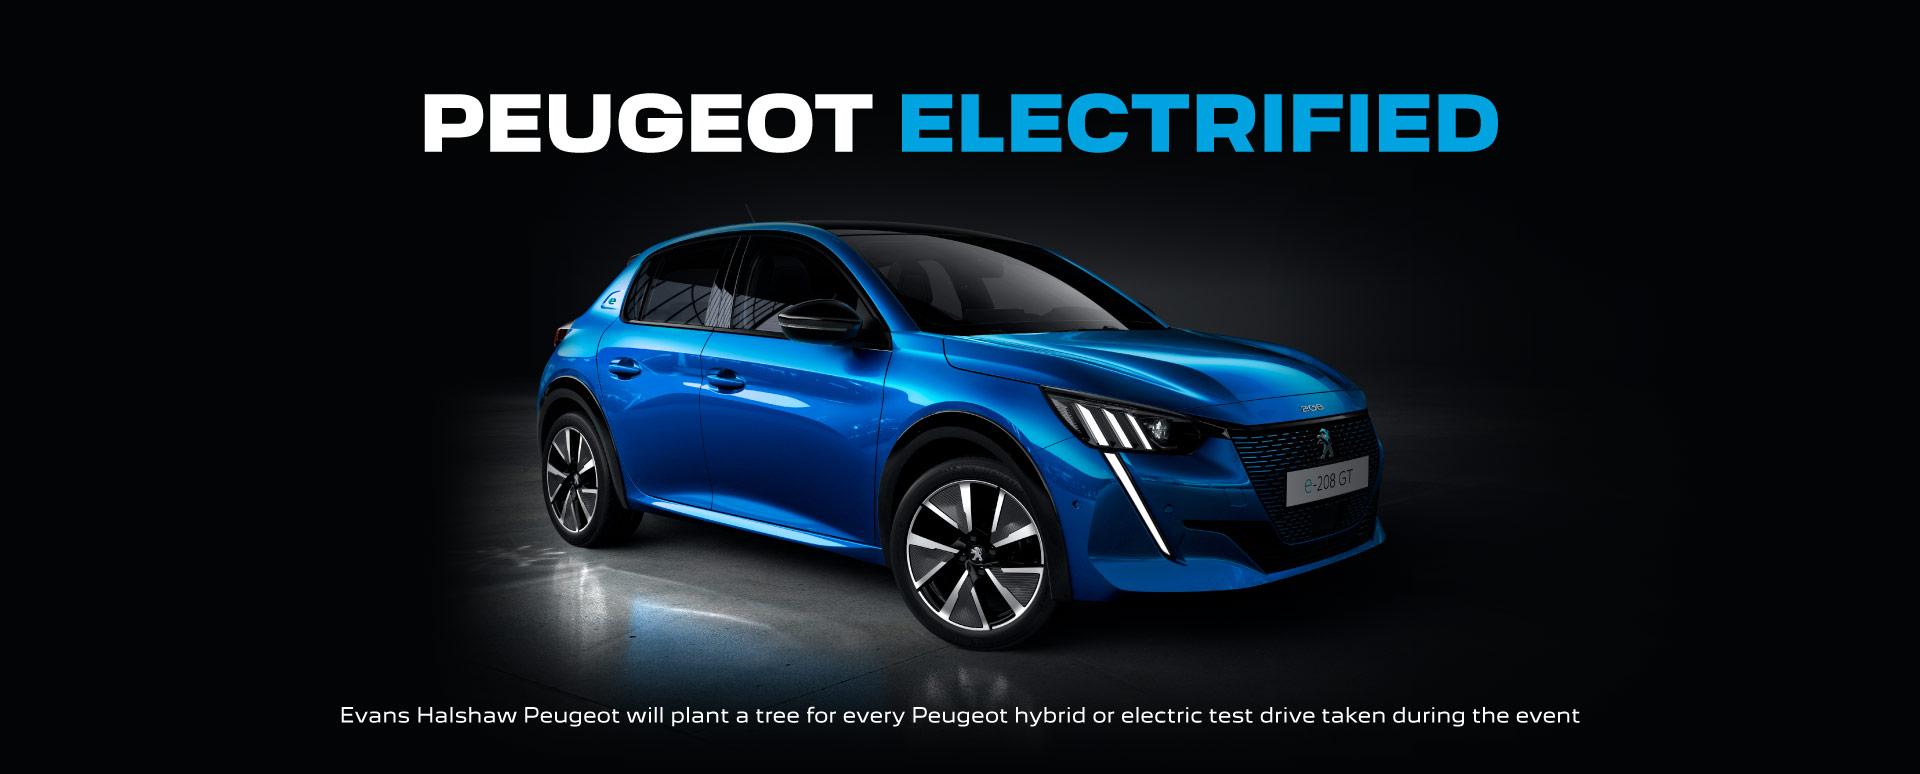 Peugeot Electrified